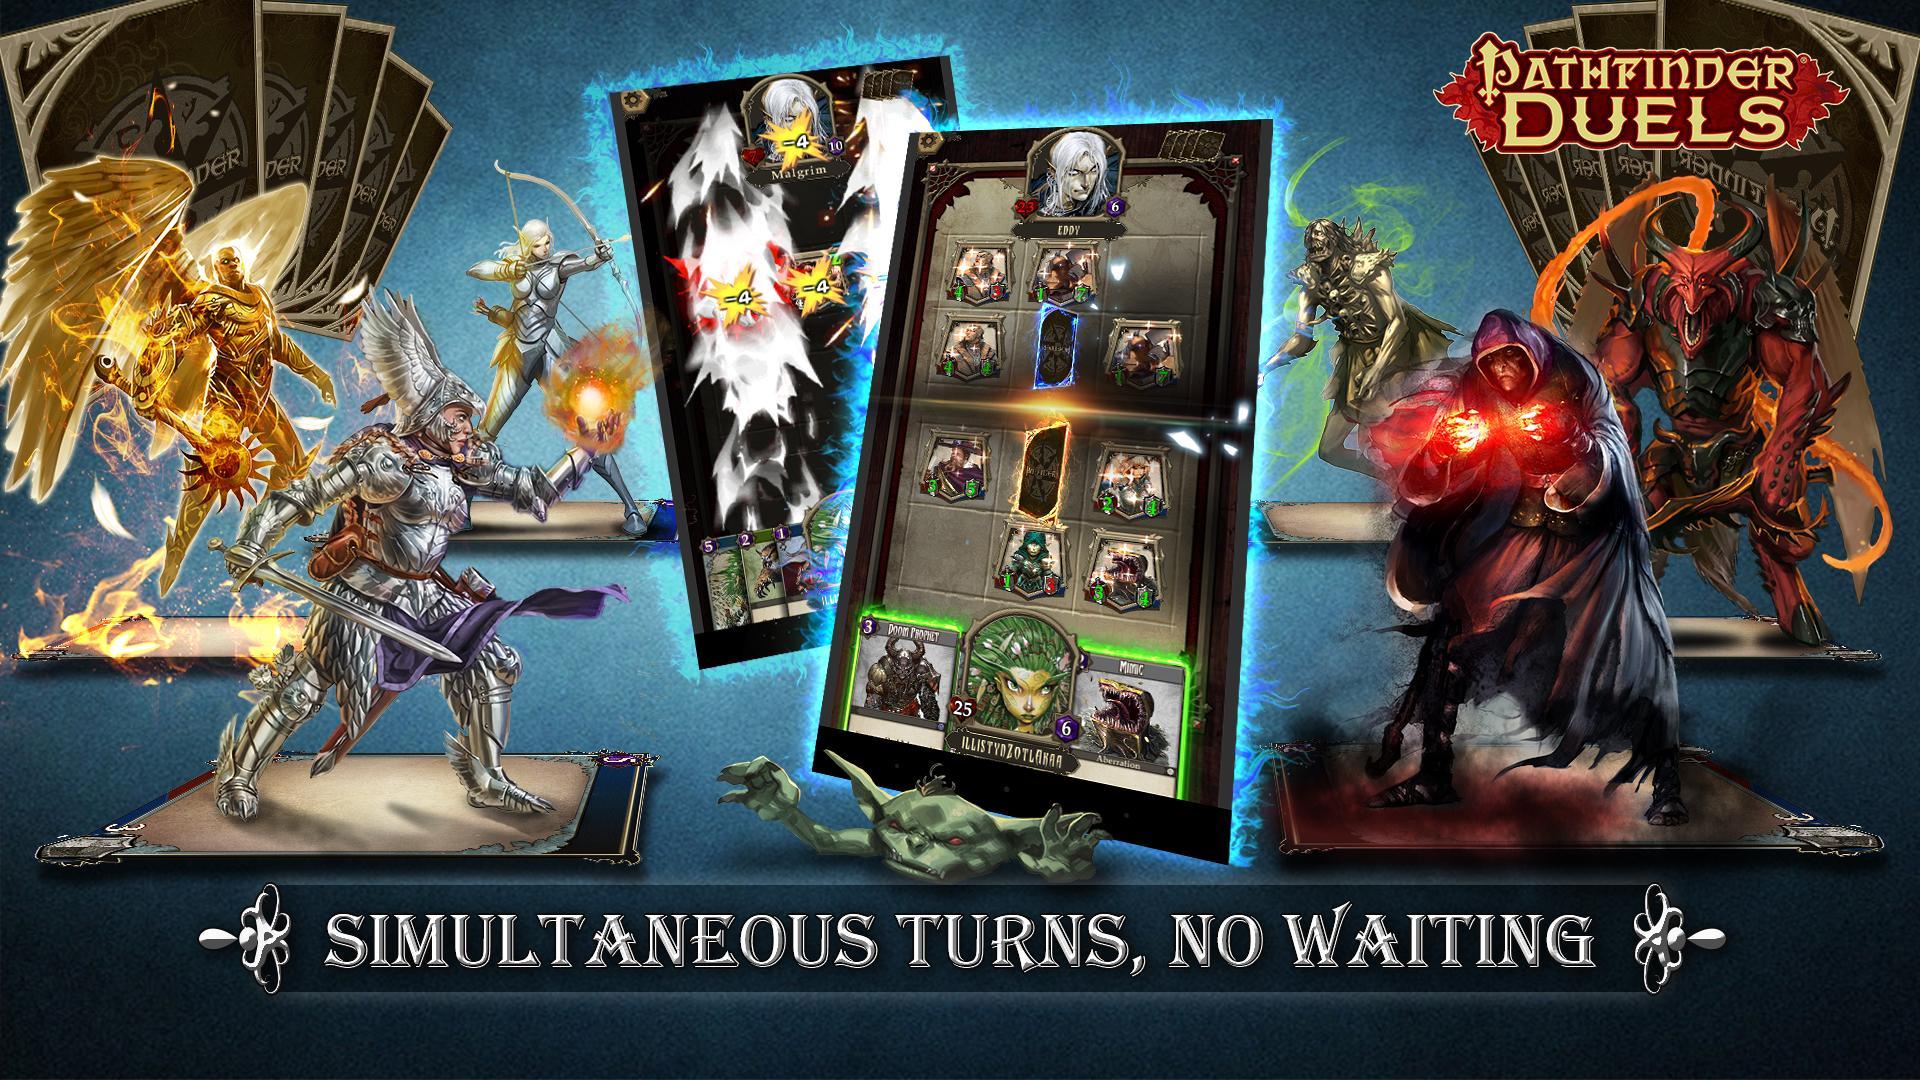 Pathfinder Duels screenshot #7